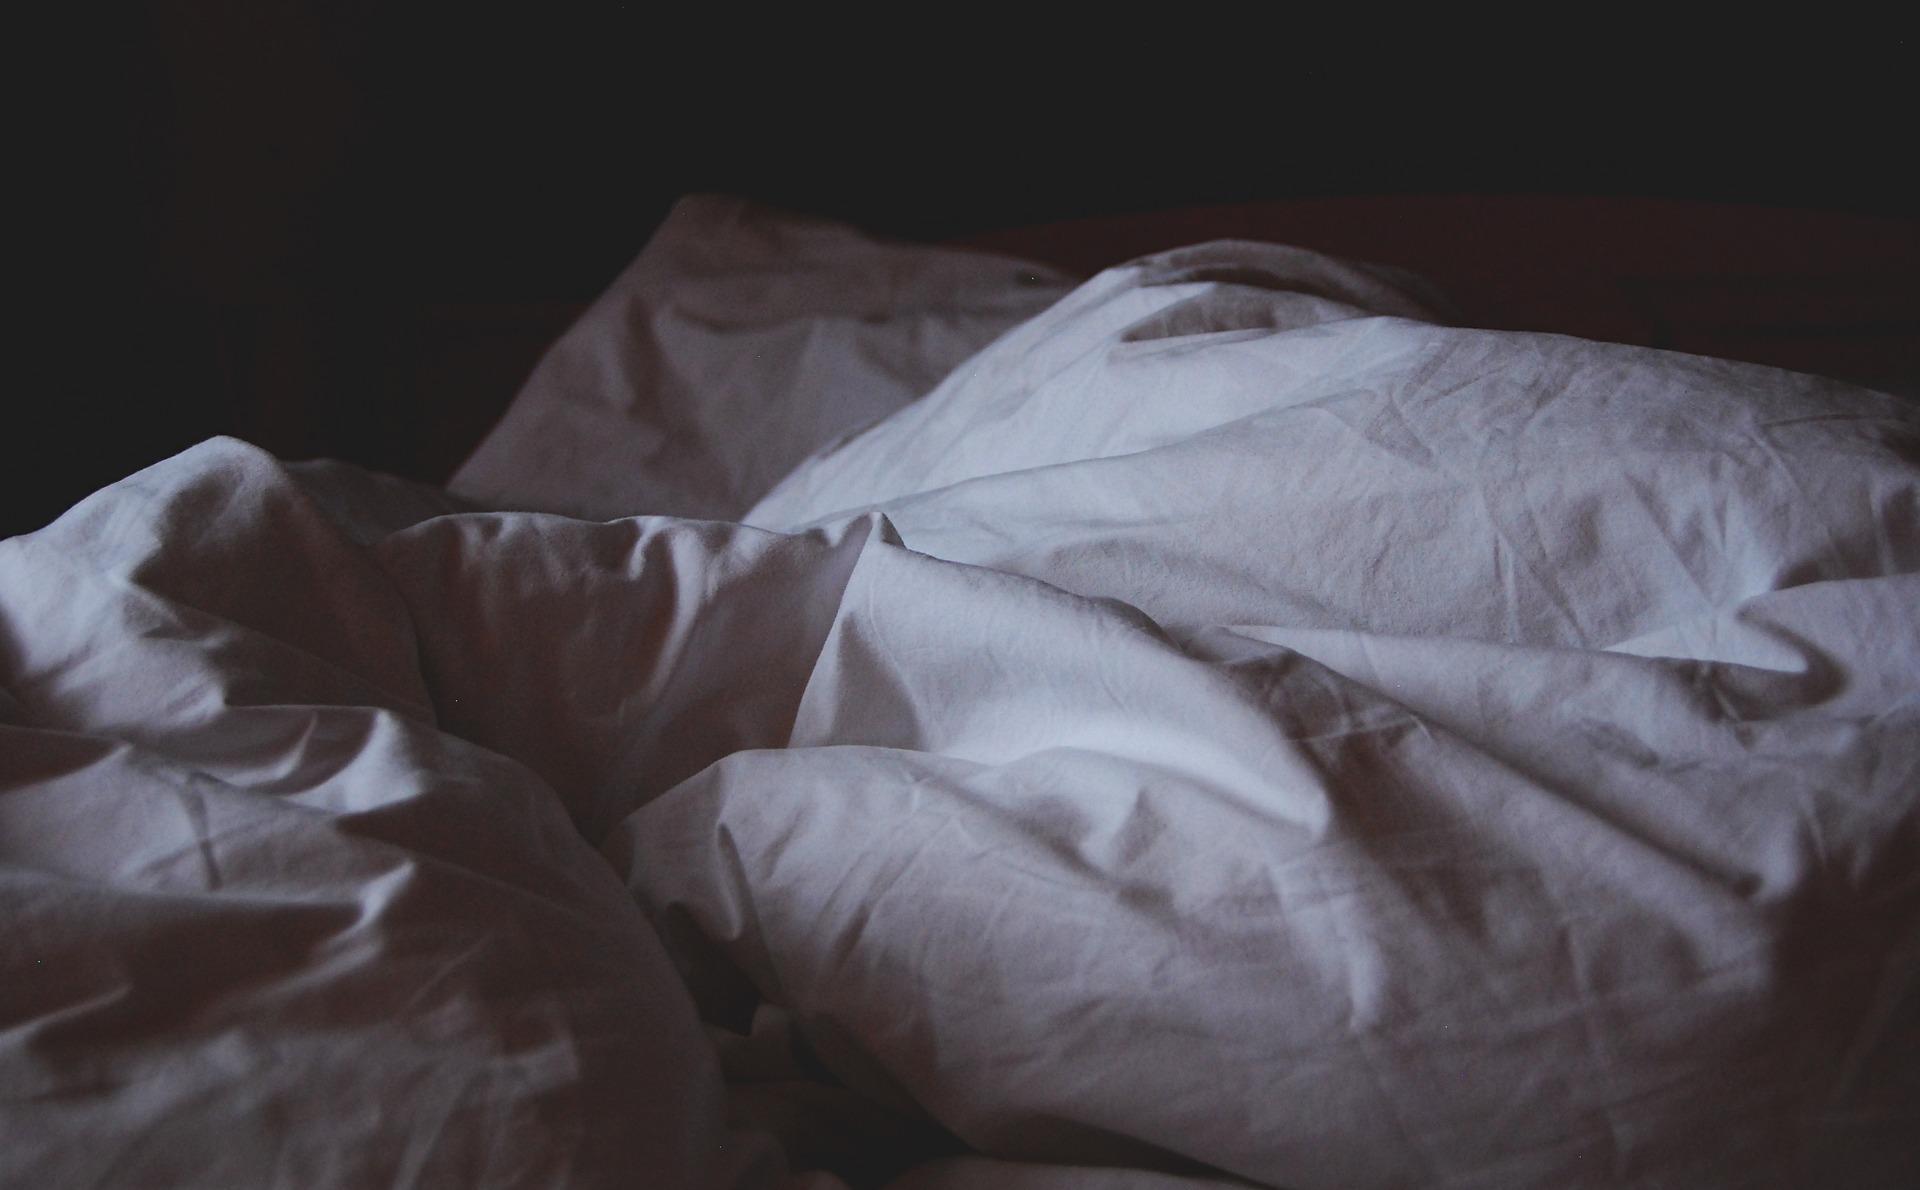 is 5 hours of sleep enough?